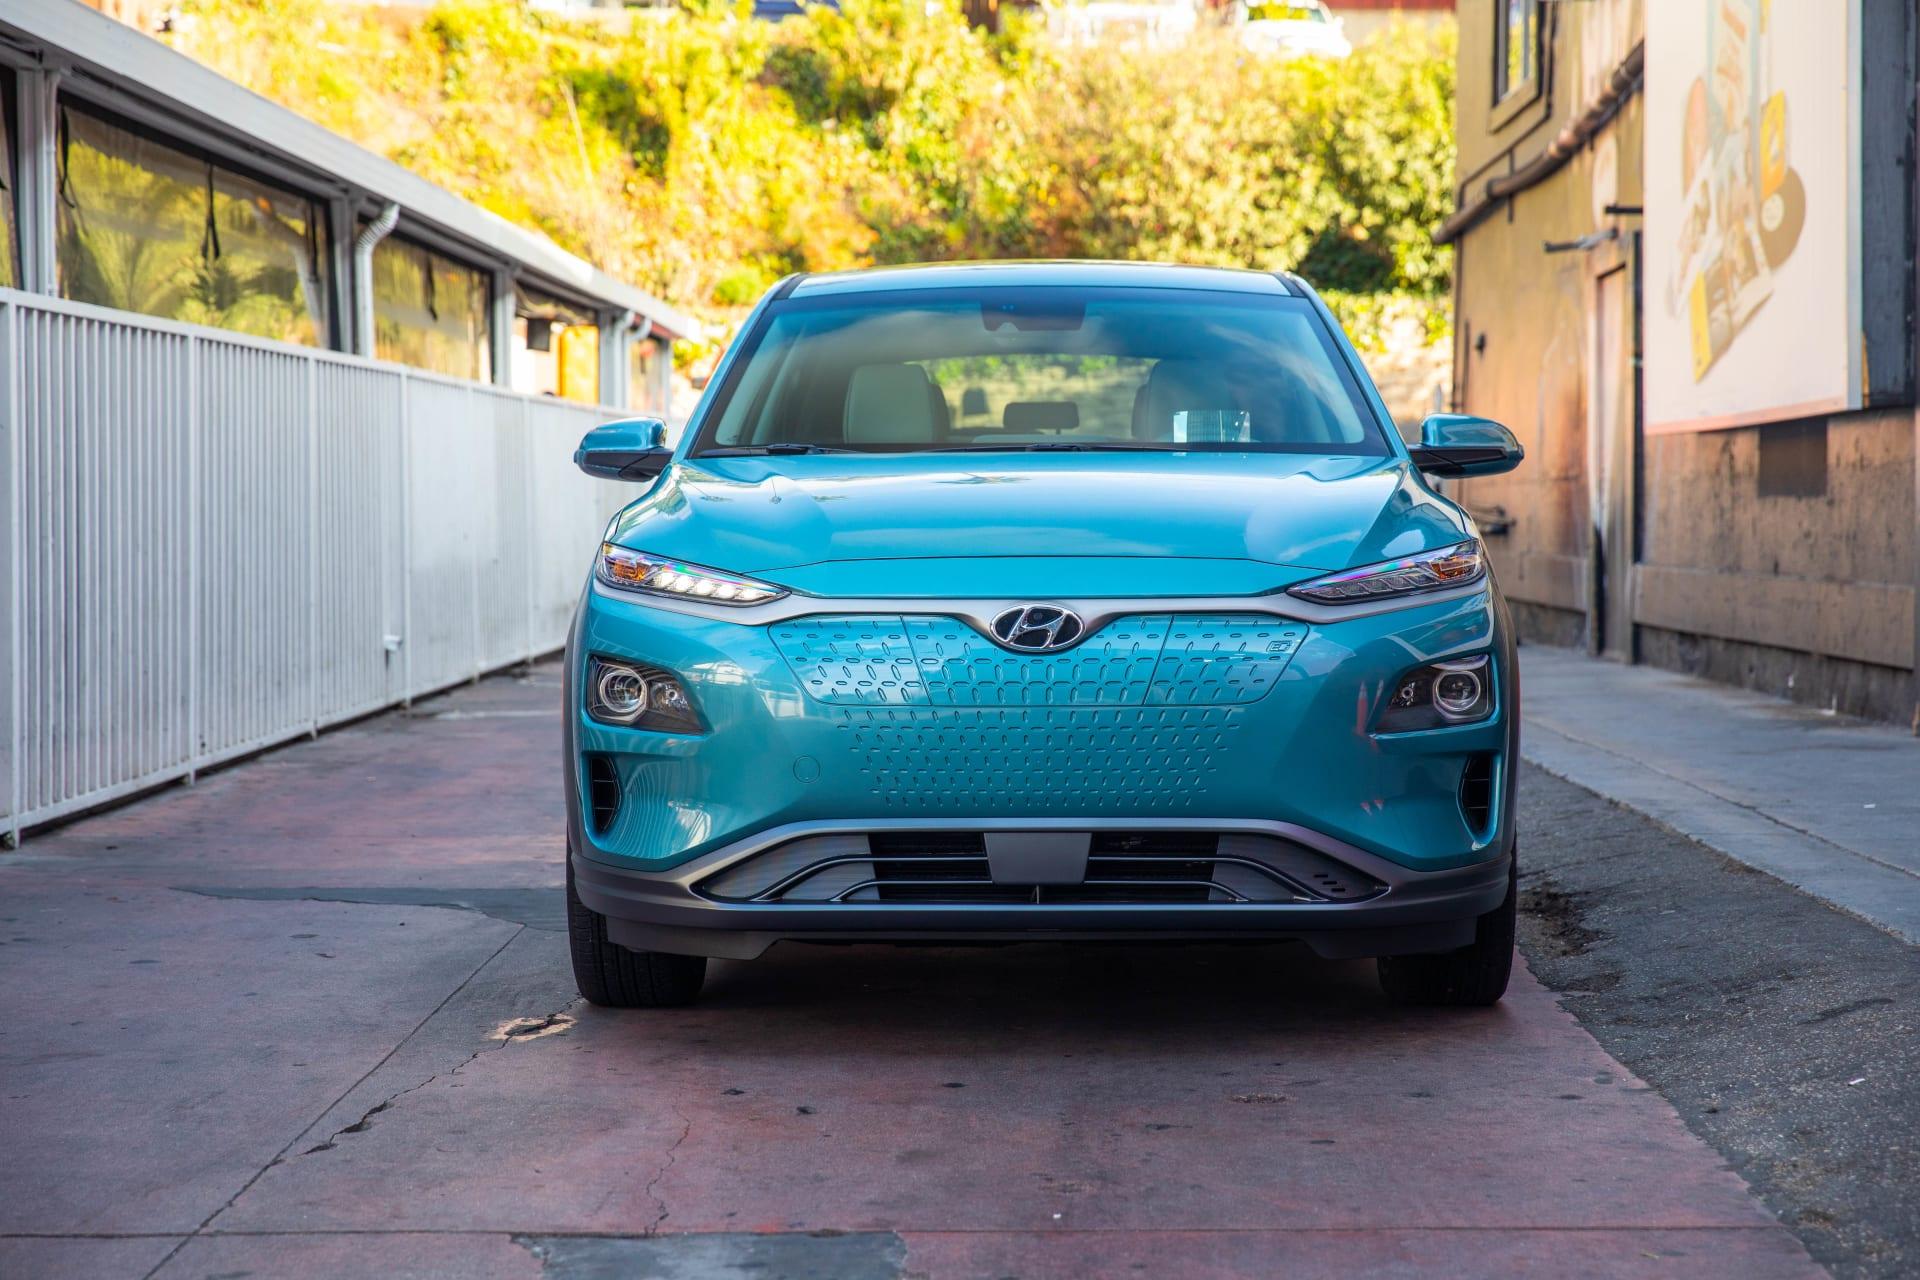 2019 Hyundai Kona Electric Priced to Sizzle | News | Cars com